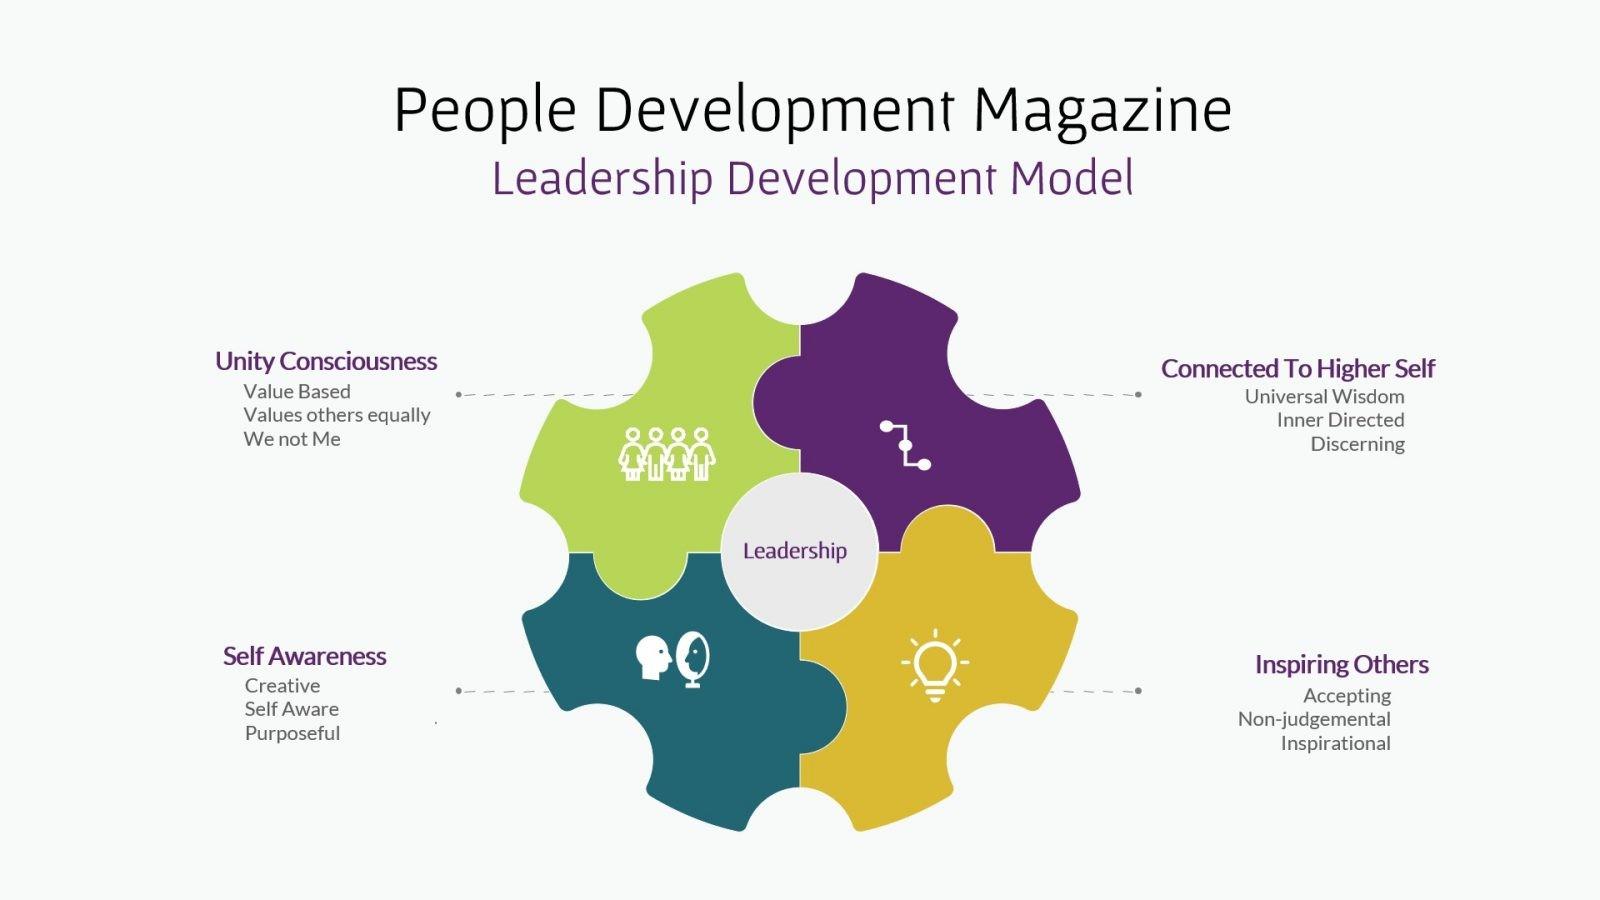 People Development Magazine Leadership Development Model